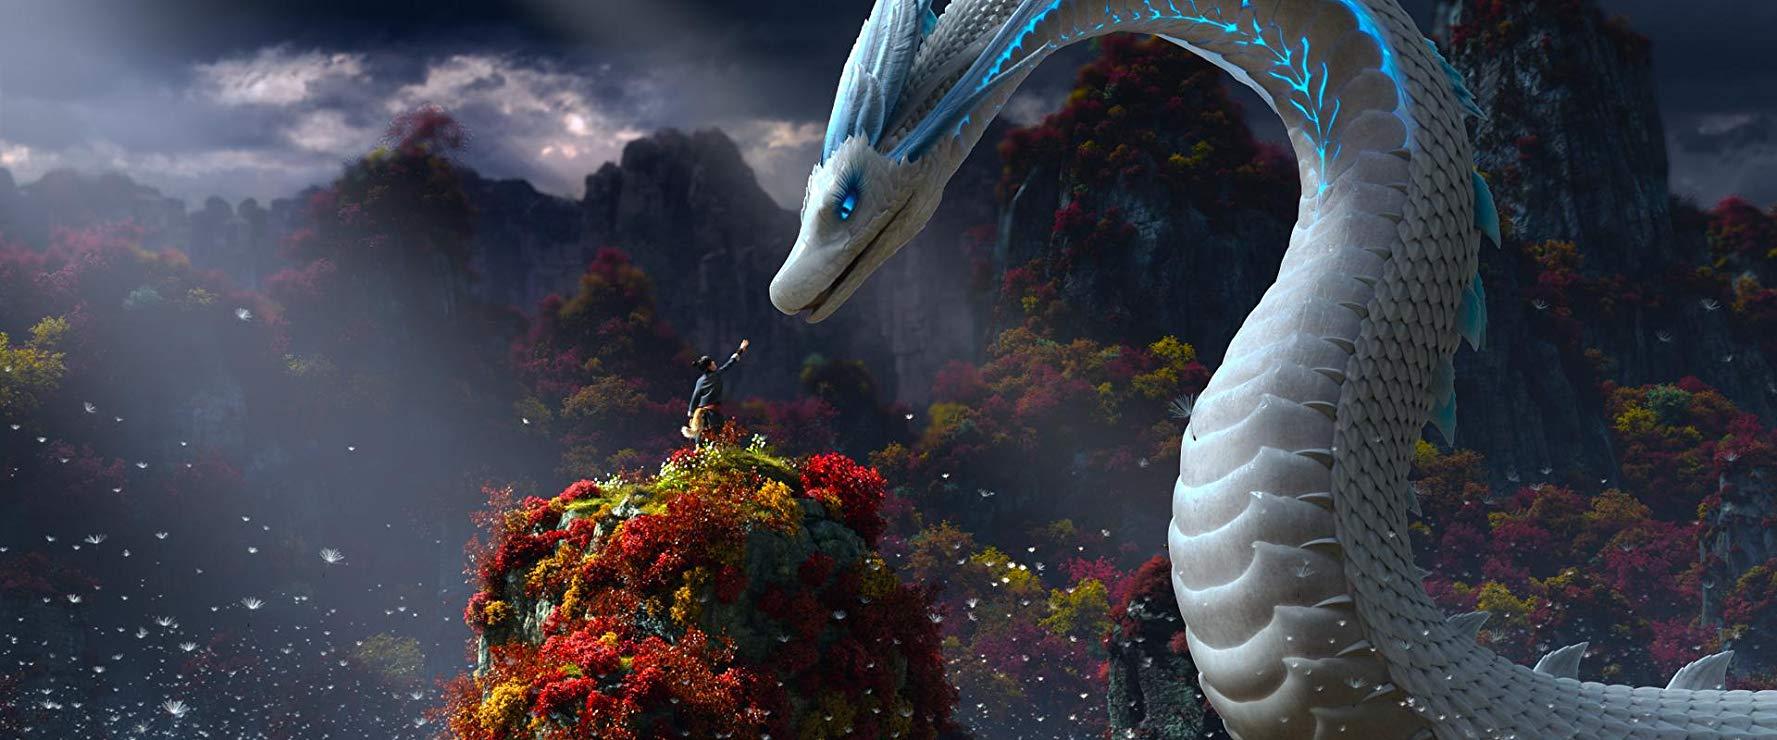 [CN] White Snake (2019) : อีกหนี่งตำนานที่ถูกดัดแปลงจาก ...